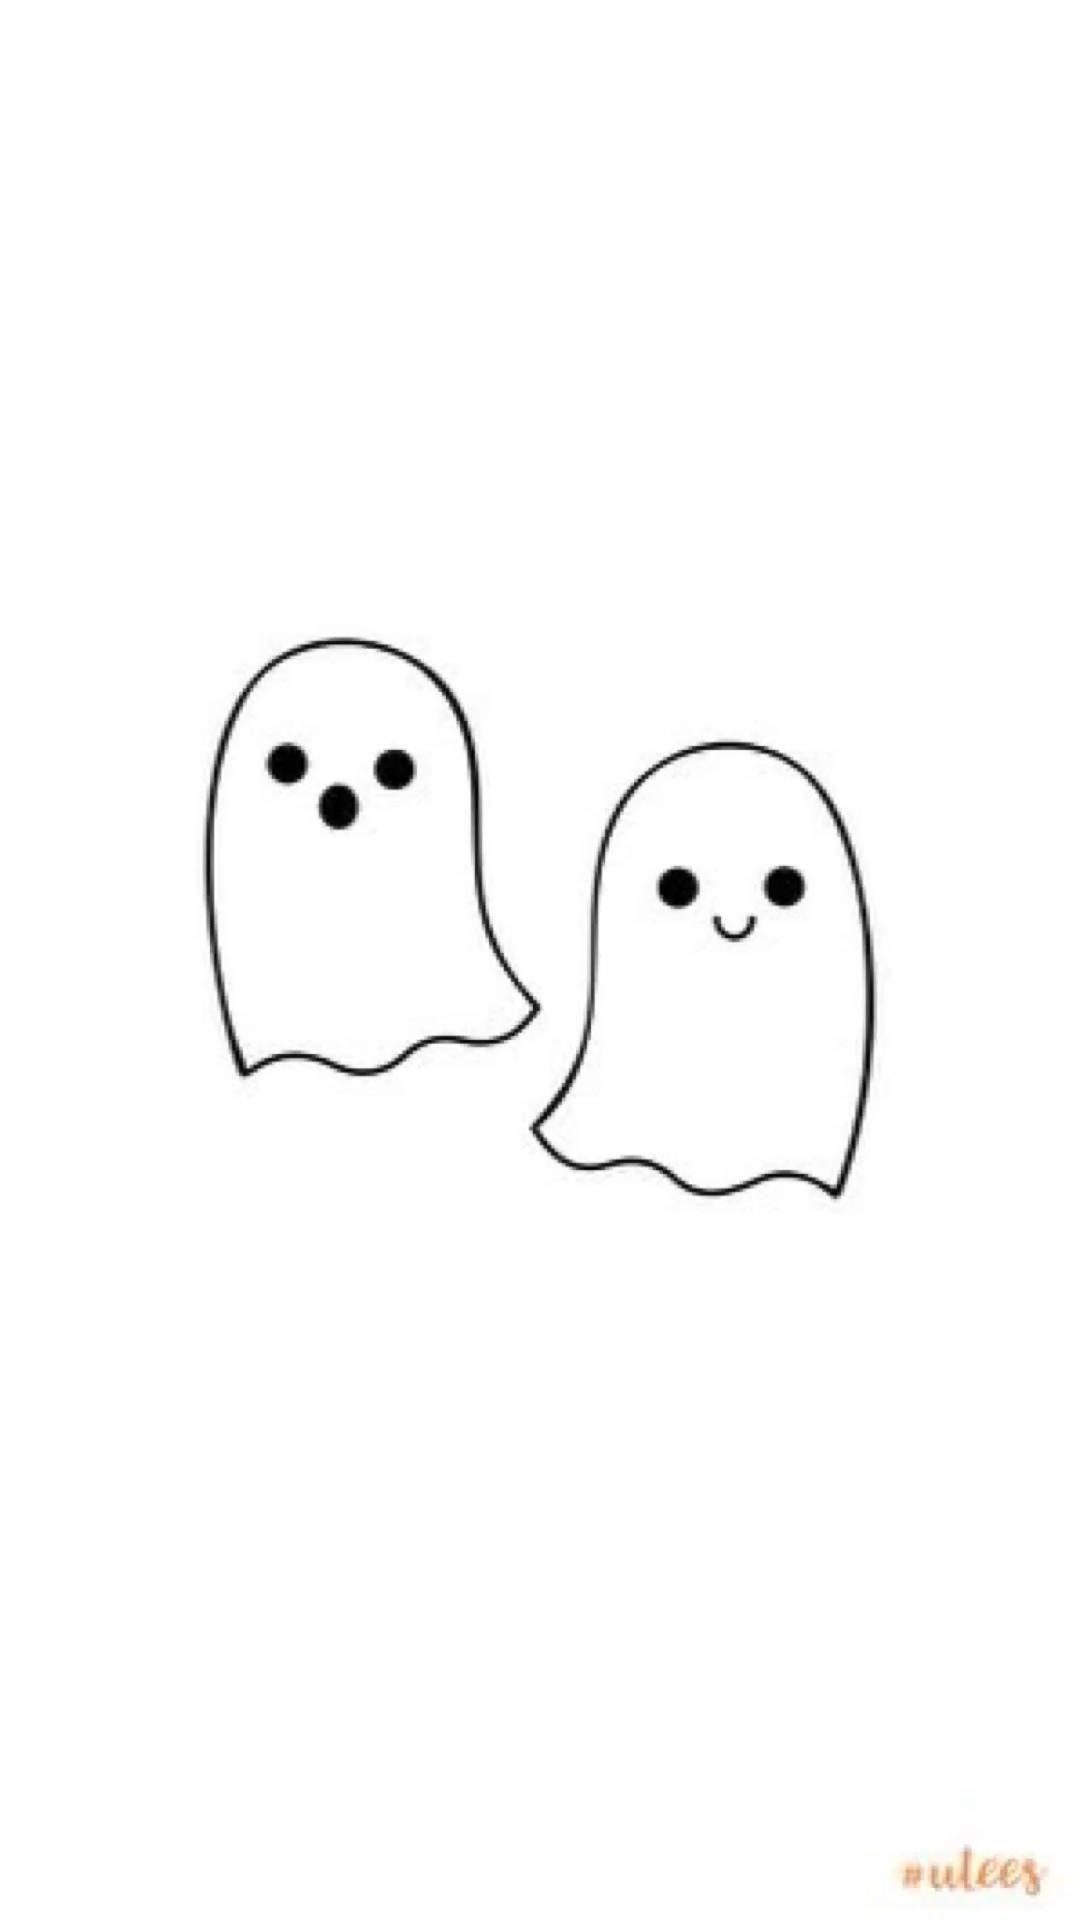 halloween is right around the corner girlies!! 🎄🎄